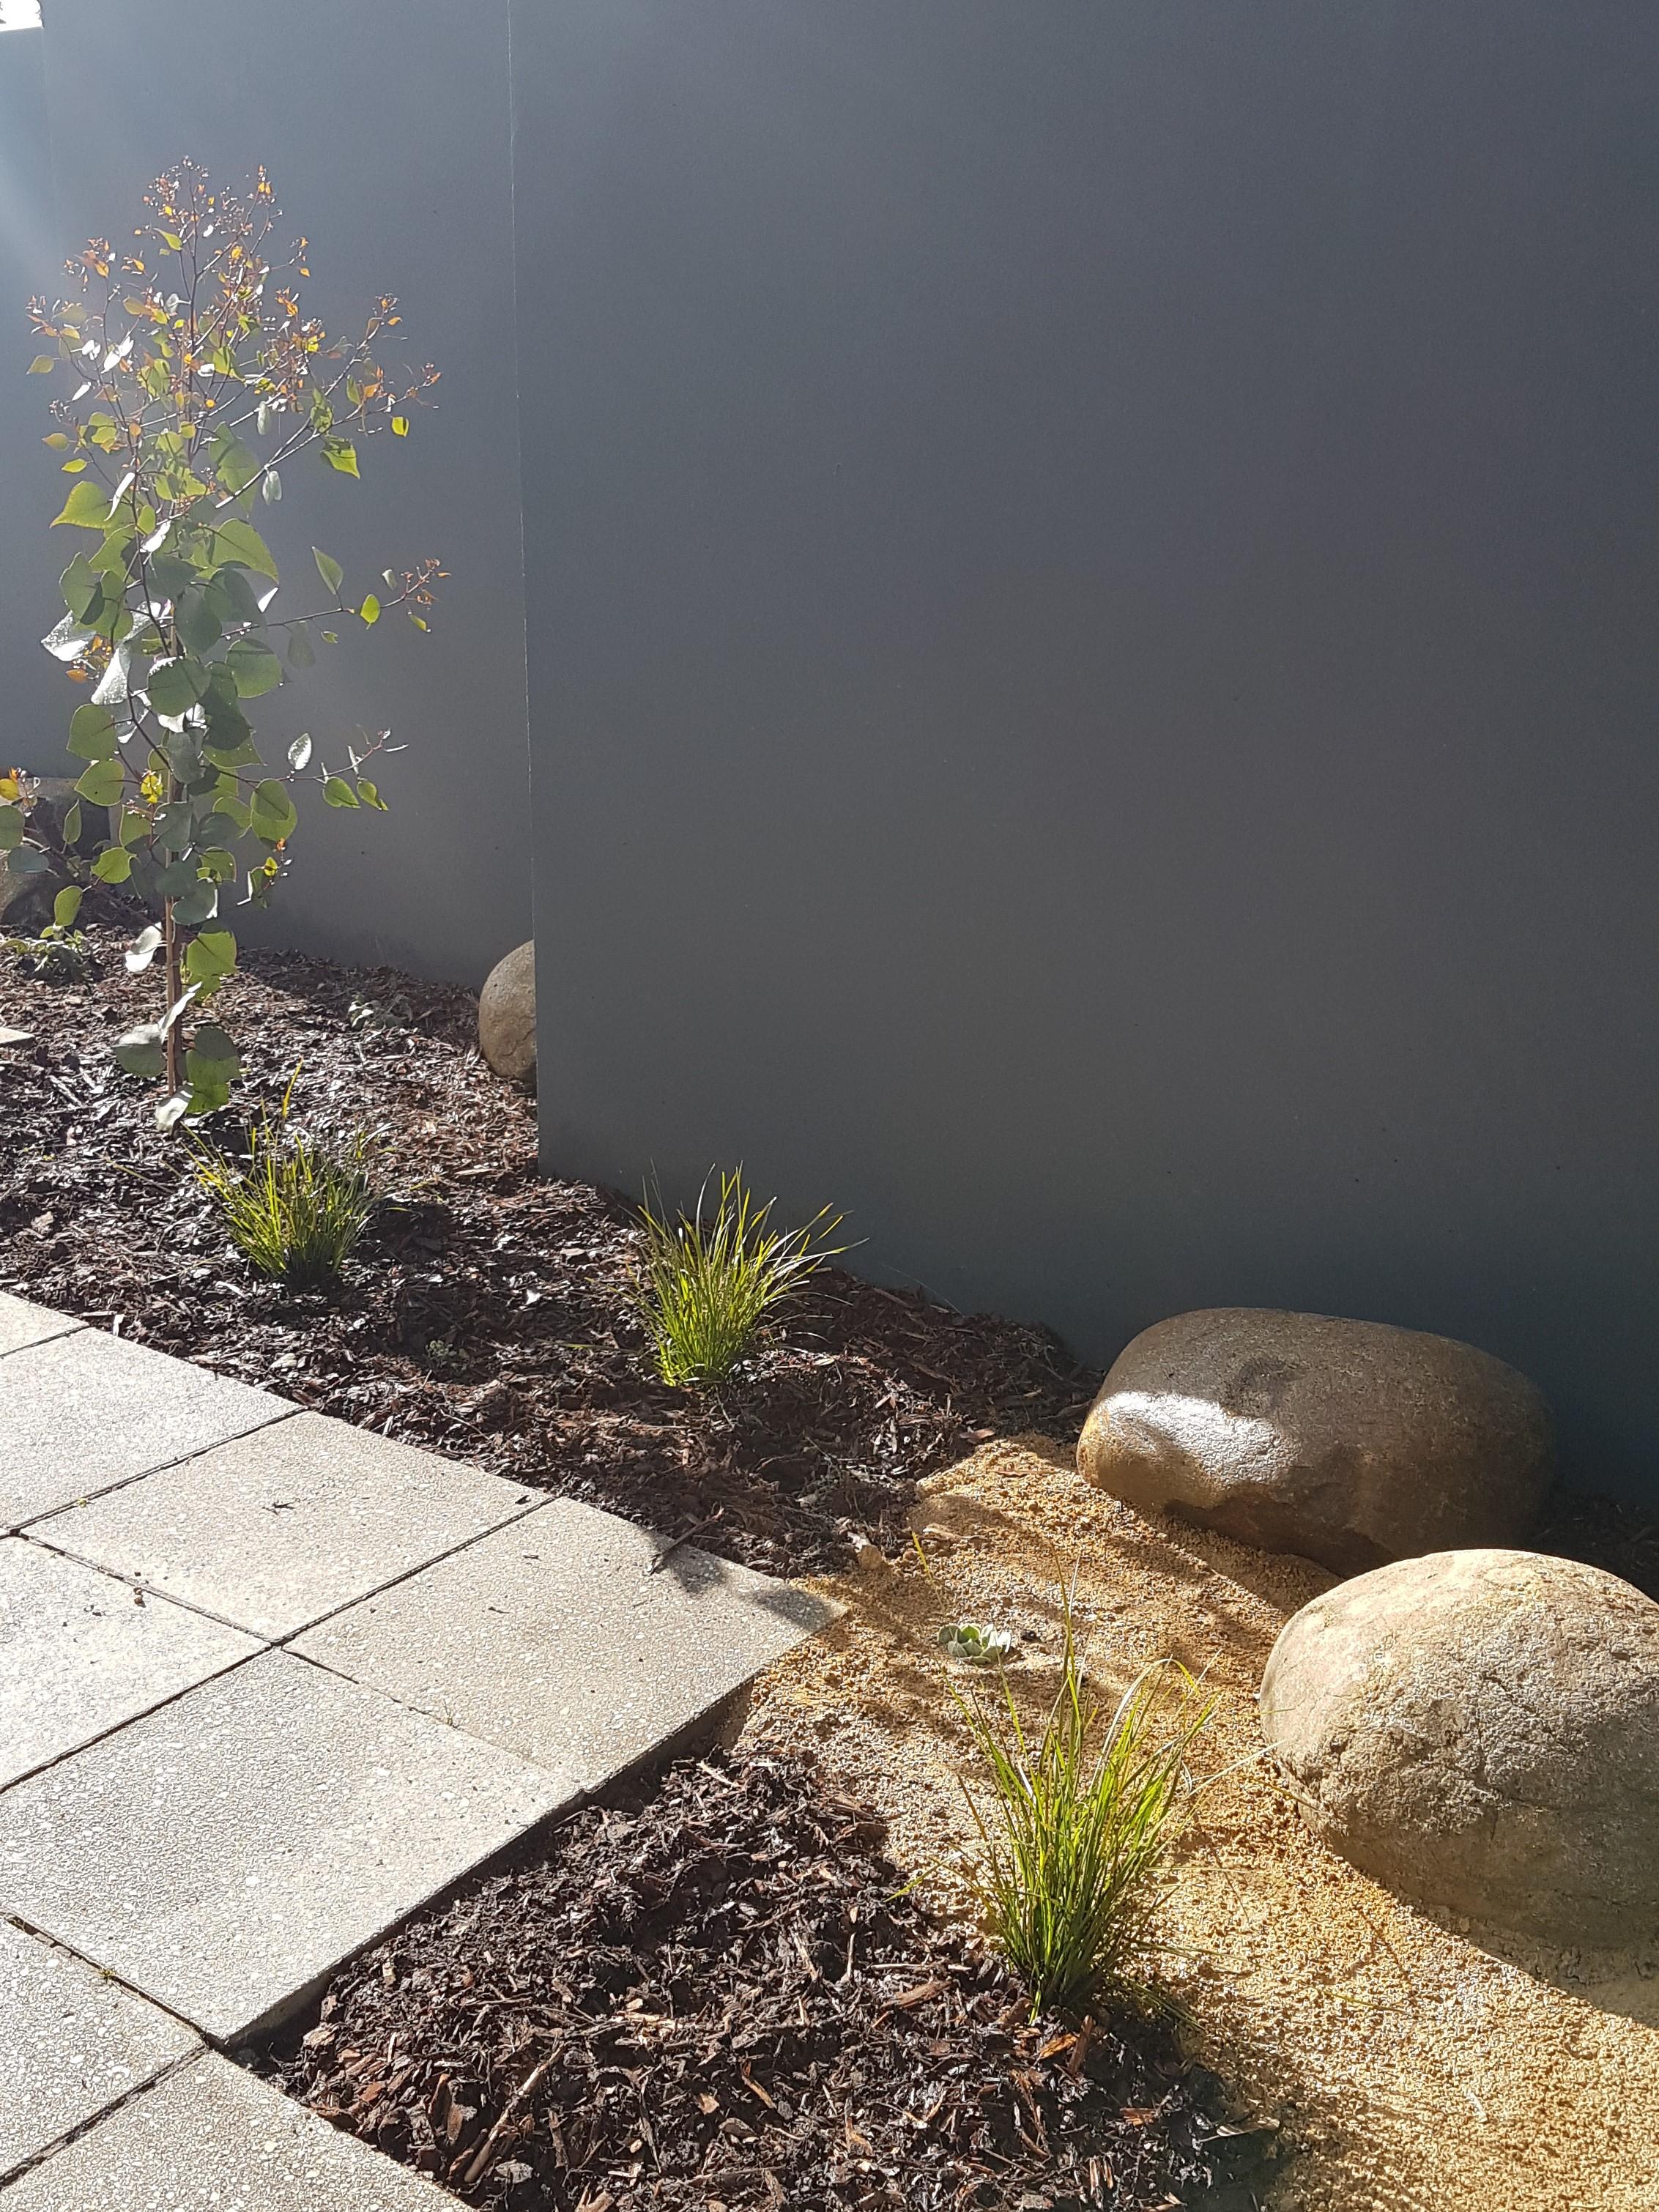 Native plants, Native commercial garden, Rocks, Devils marbles, granetic sand